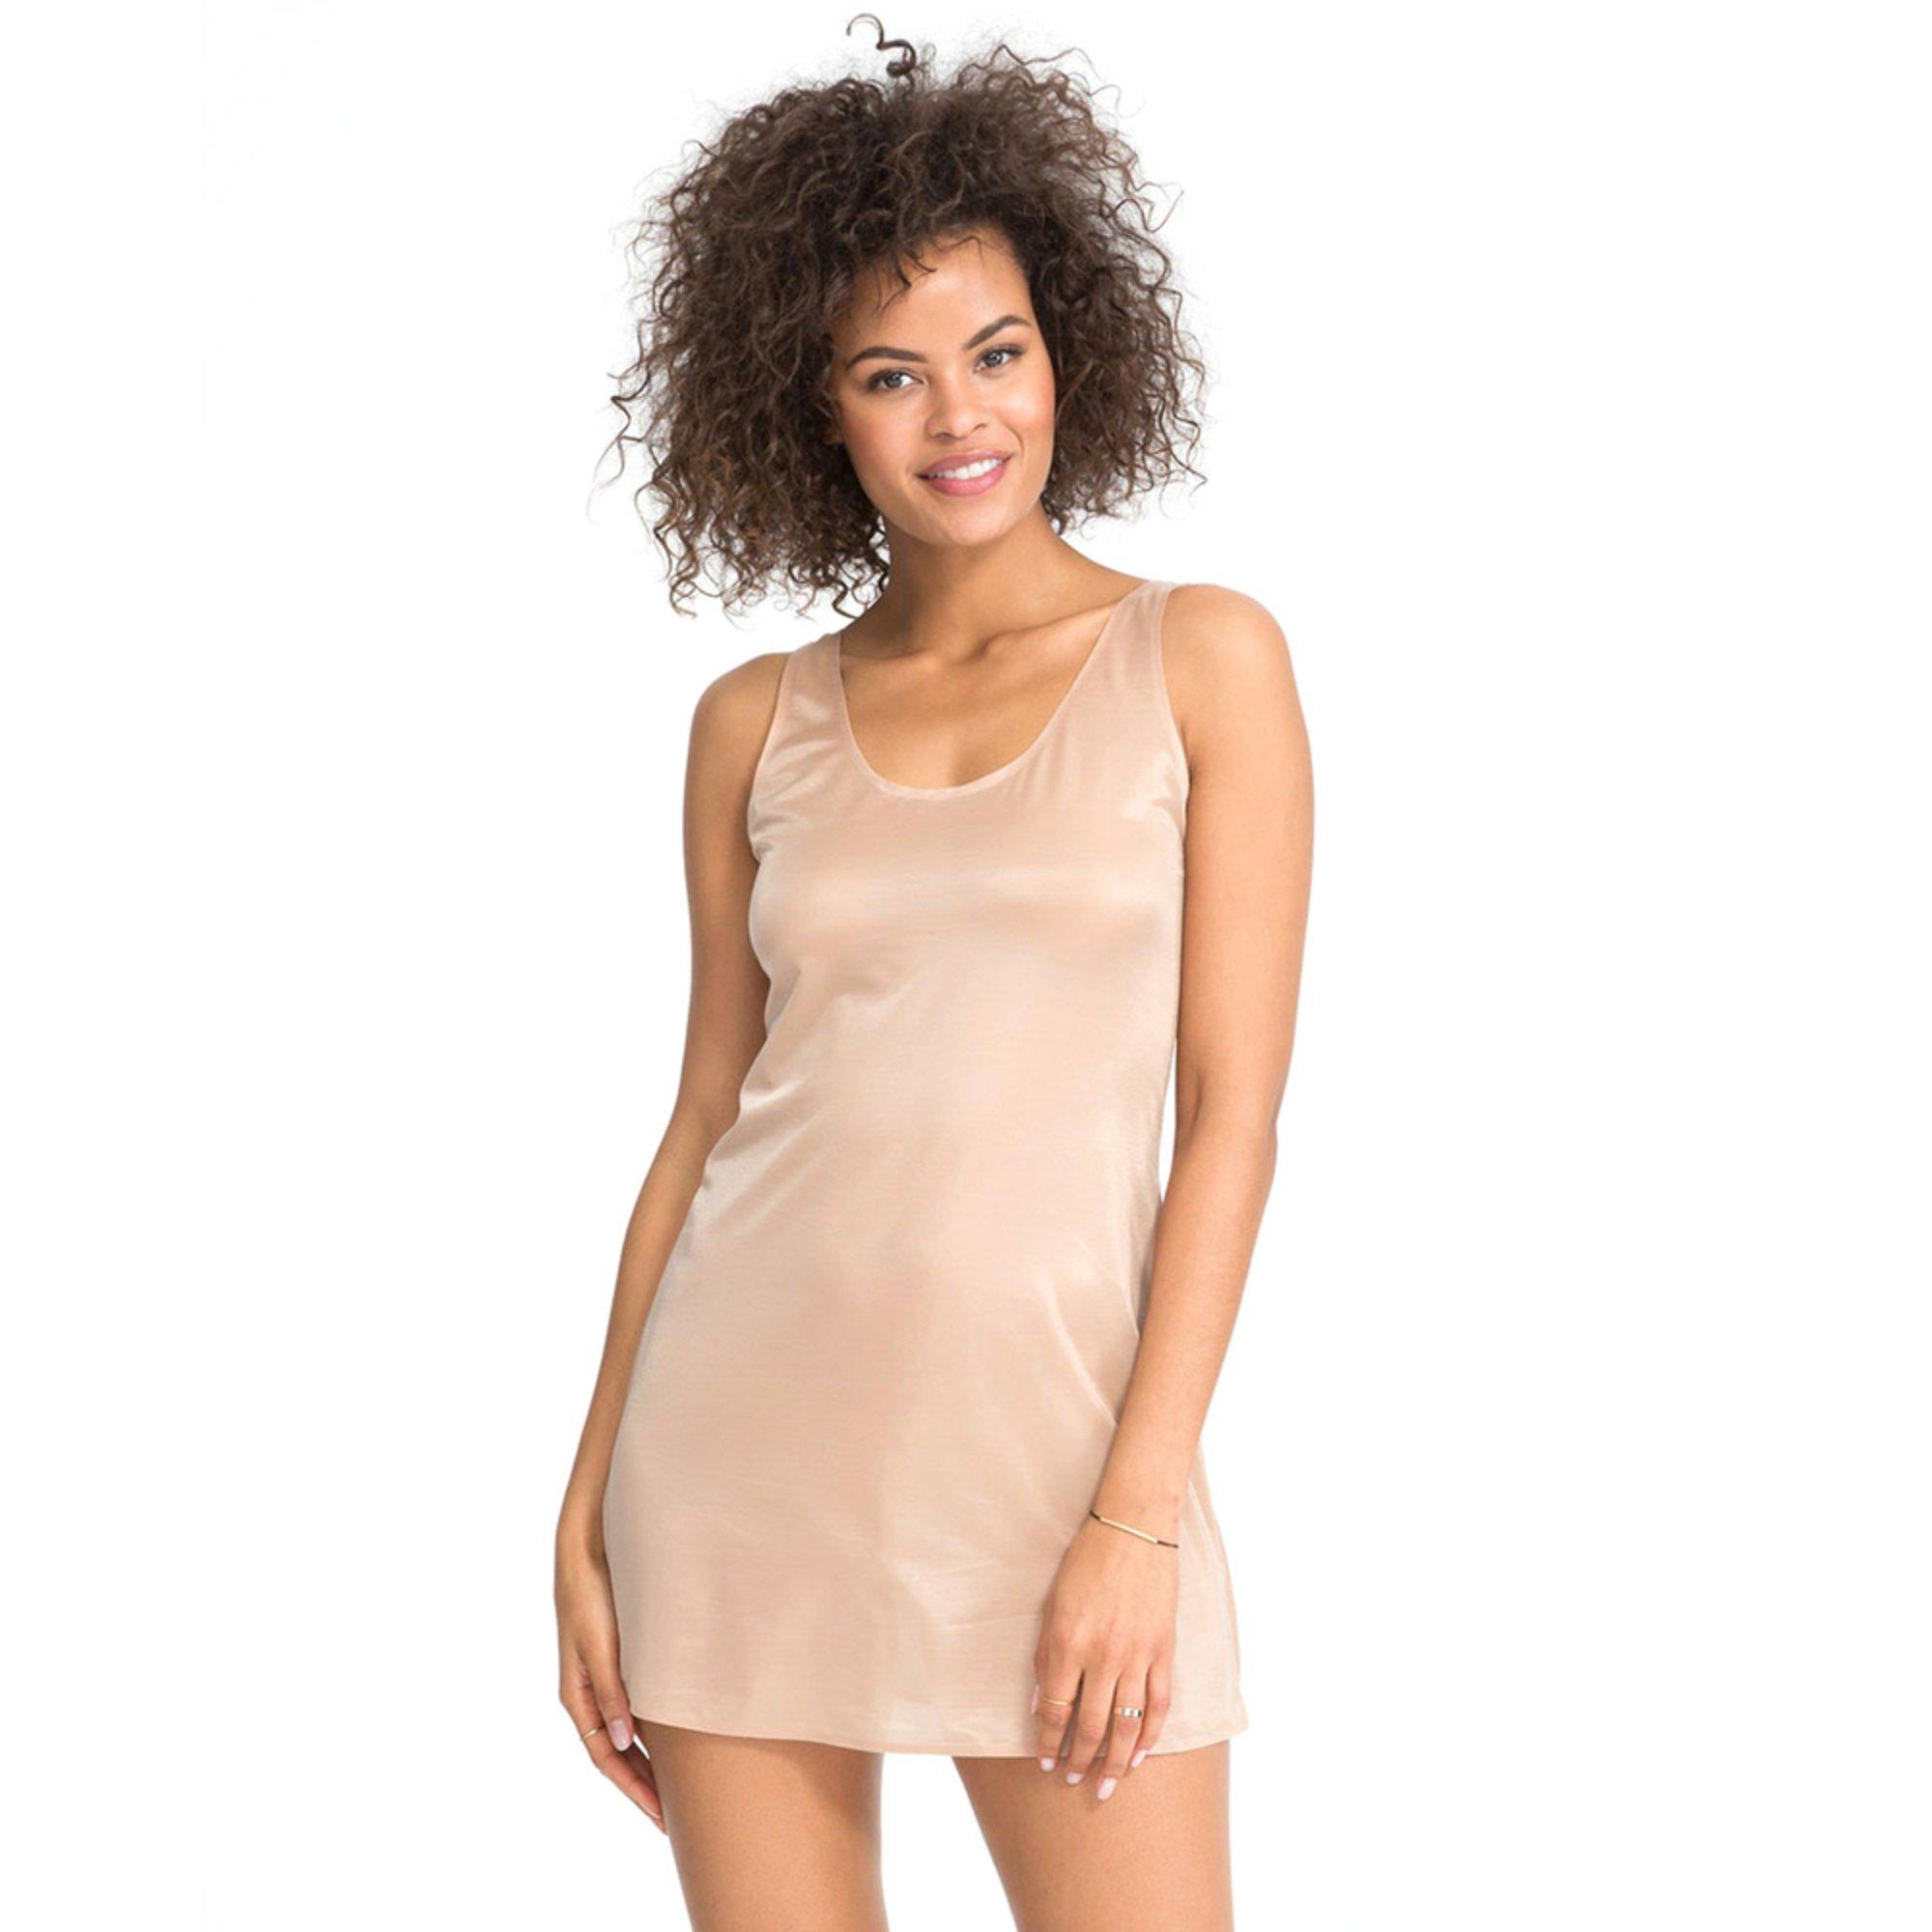 Spanx Sweep Tank Slip Naked 2.0   Women's Intimate Apparel ...